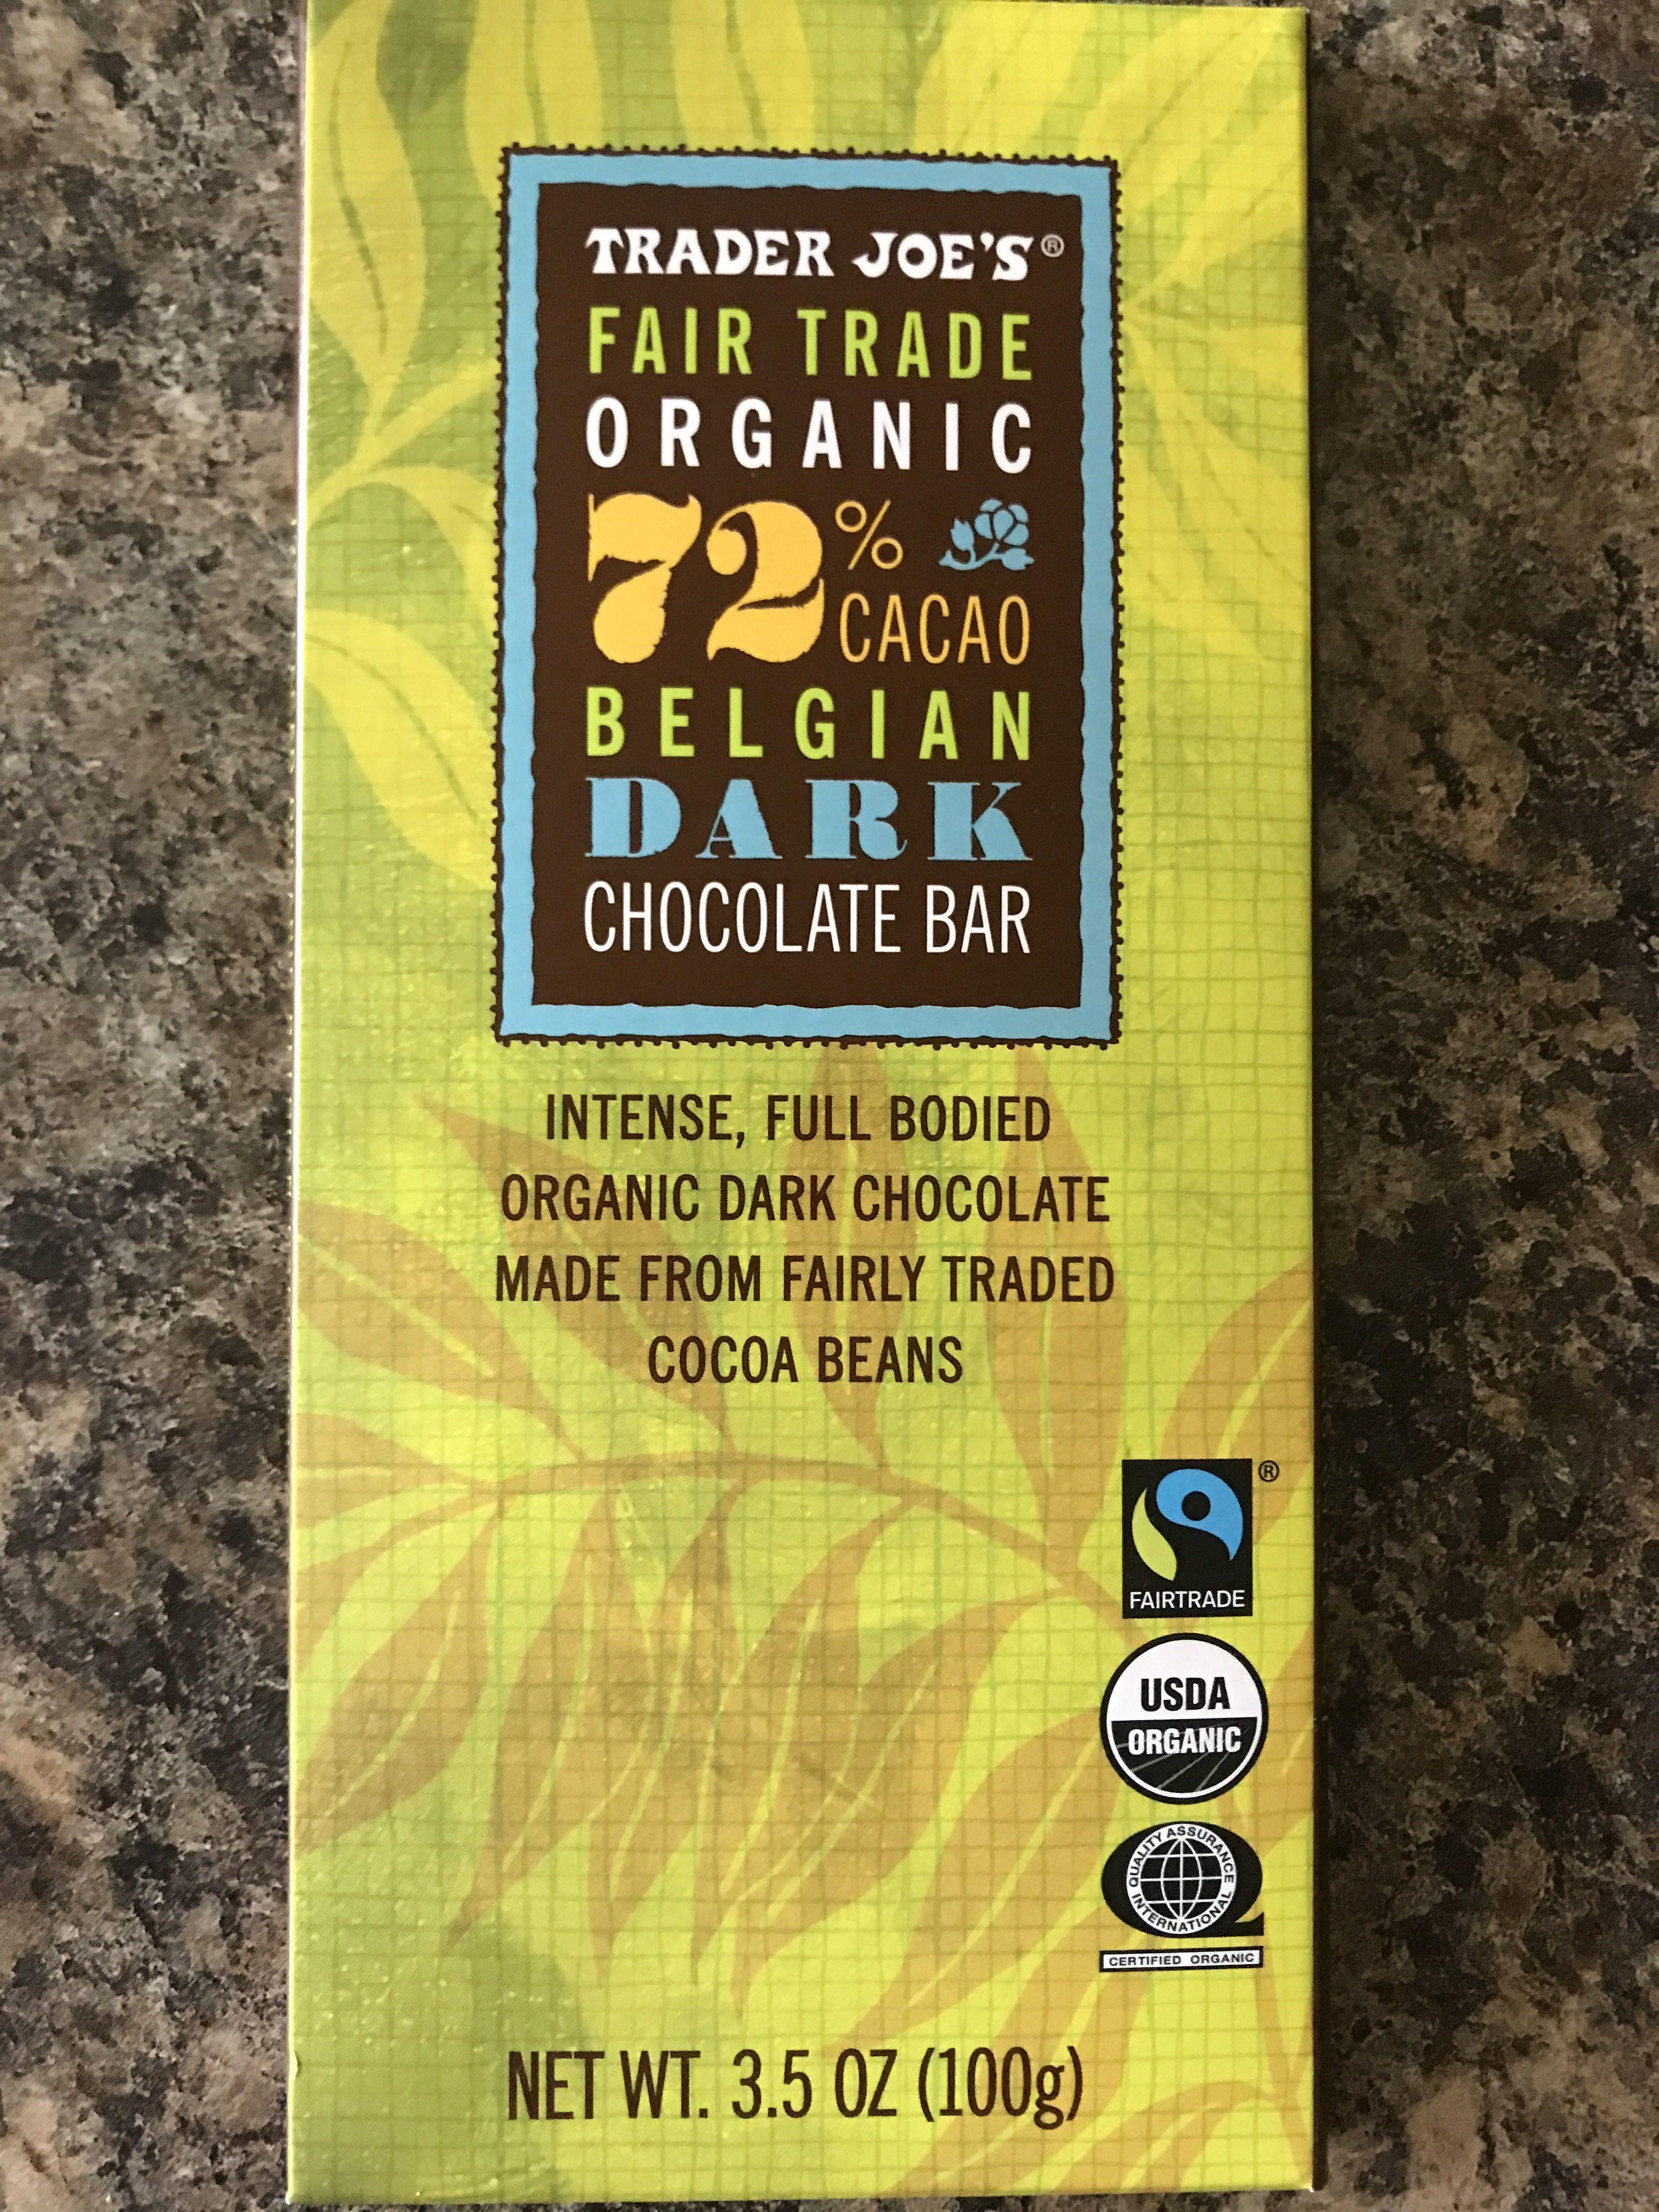 72% cacao Belgian dark chocolate bar - Product